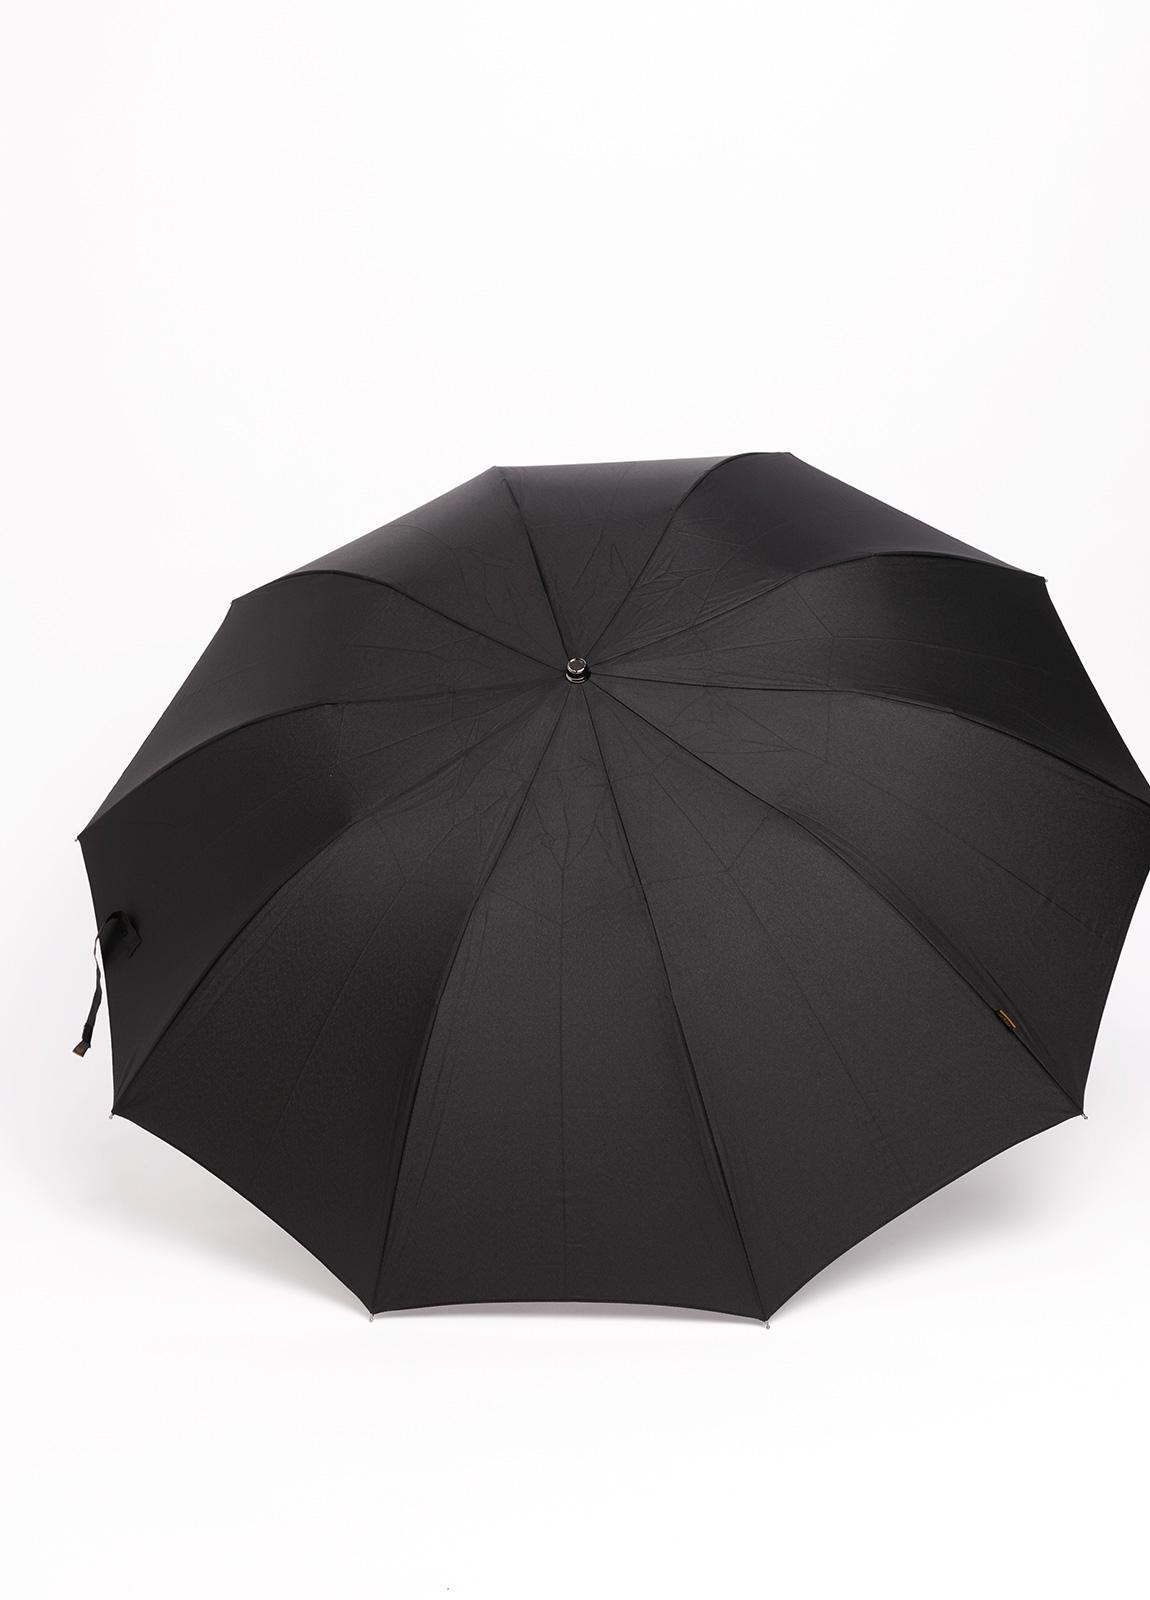 Paraguas FUREST COLECCIÓN plegable puño de madera. - Ítem1